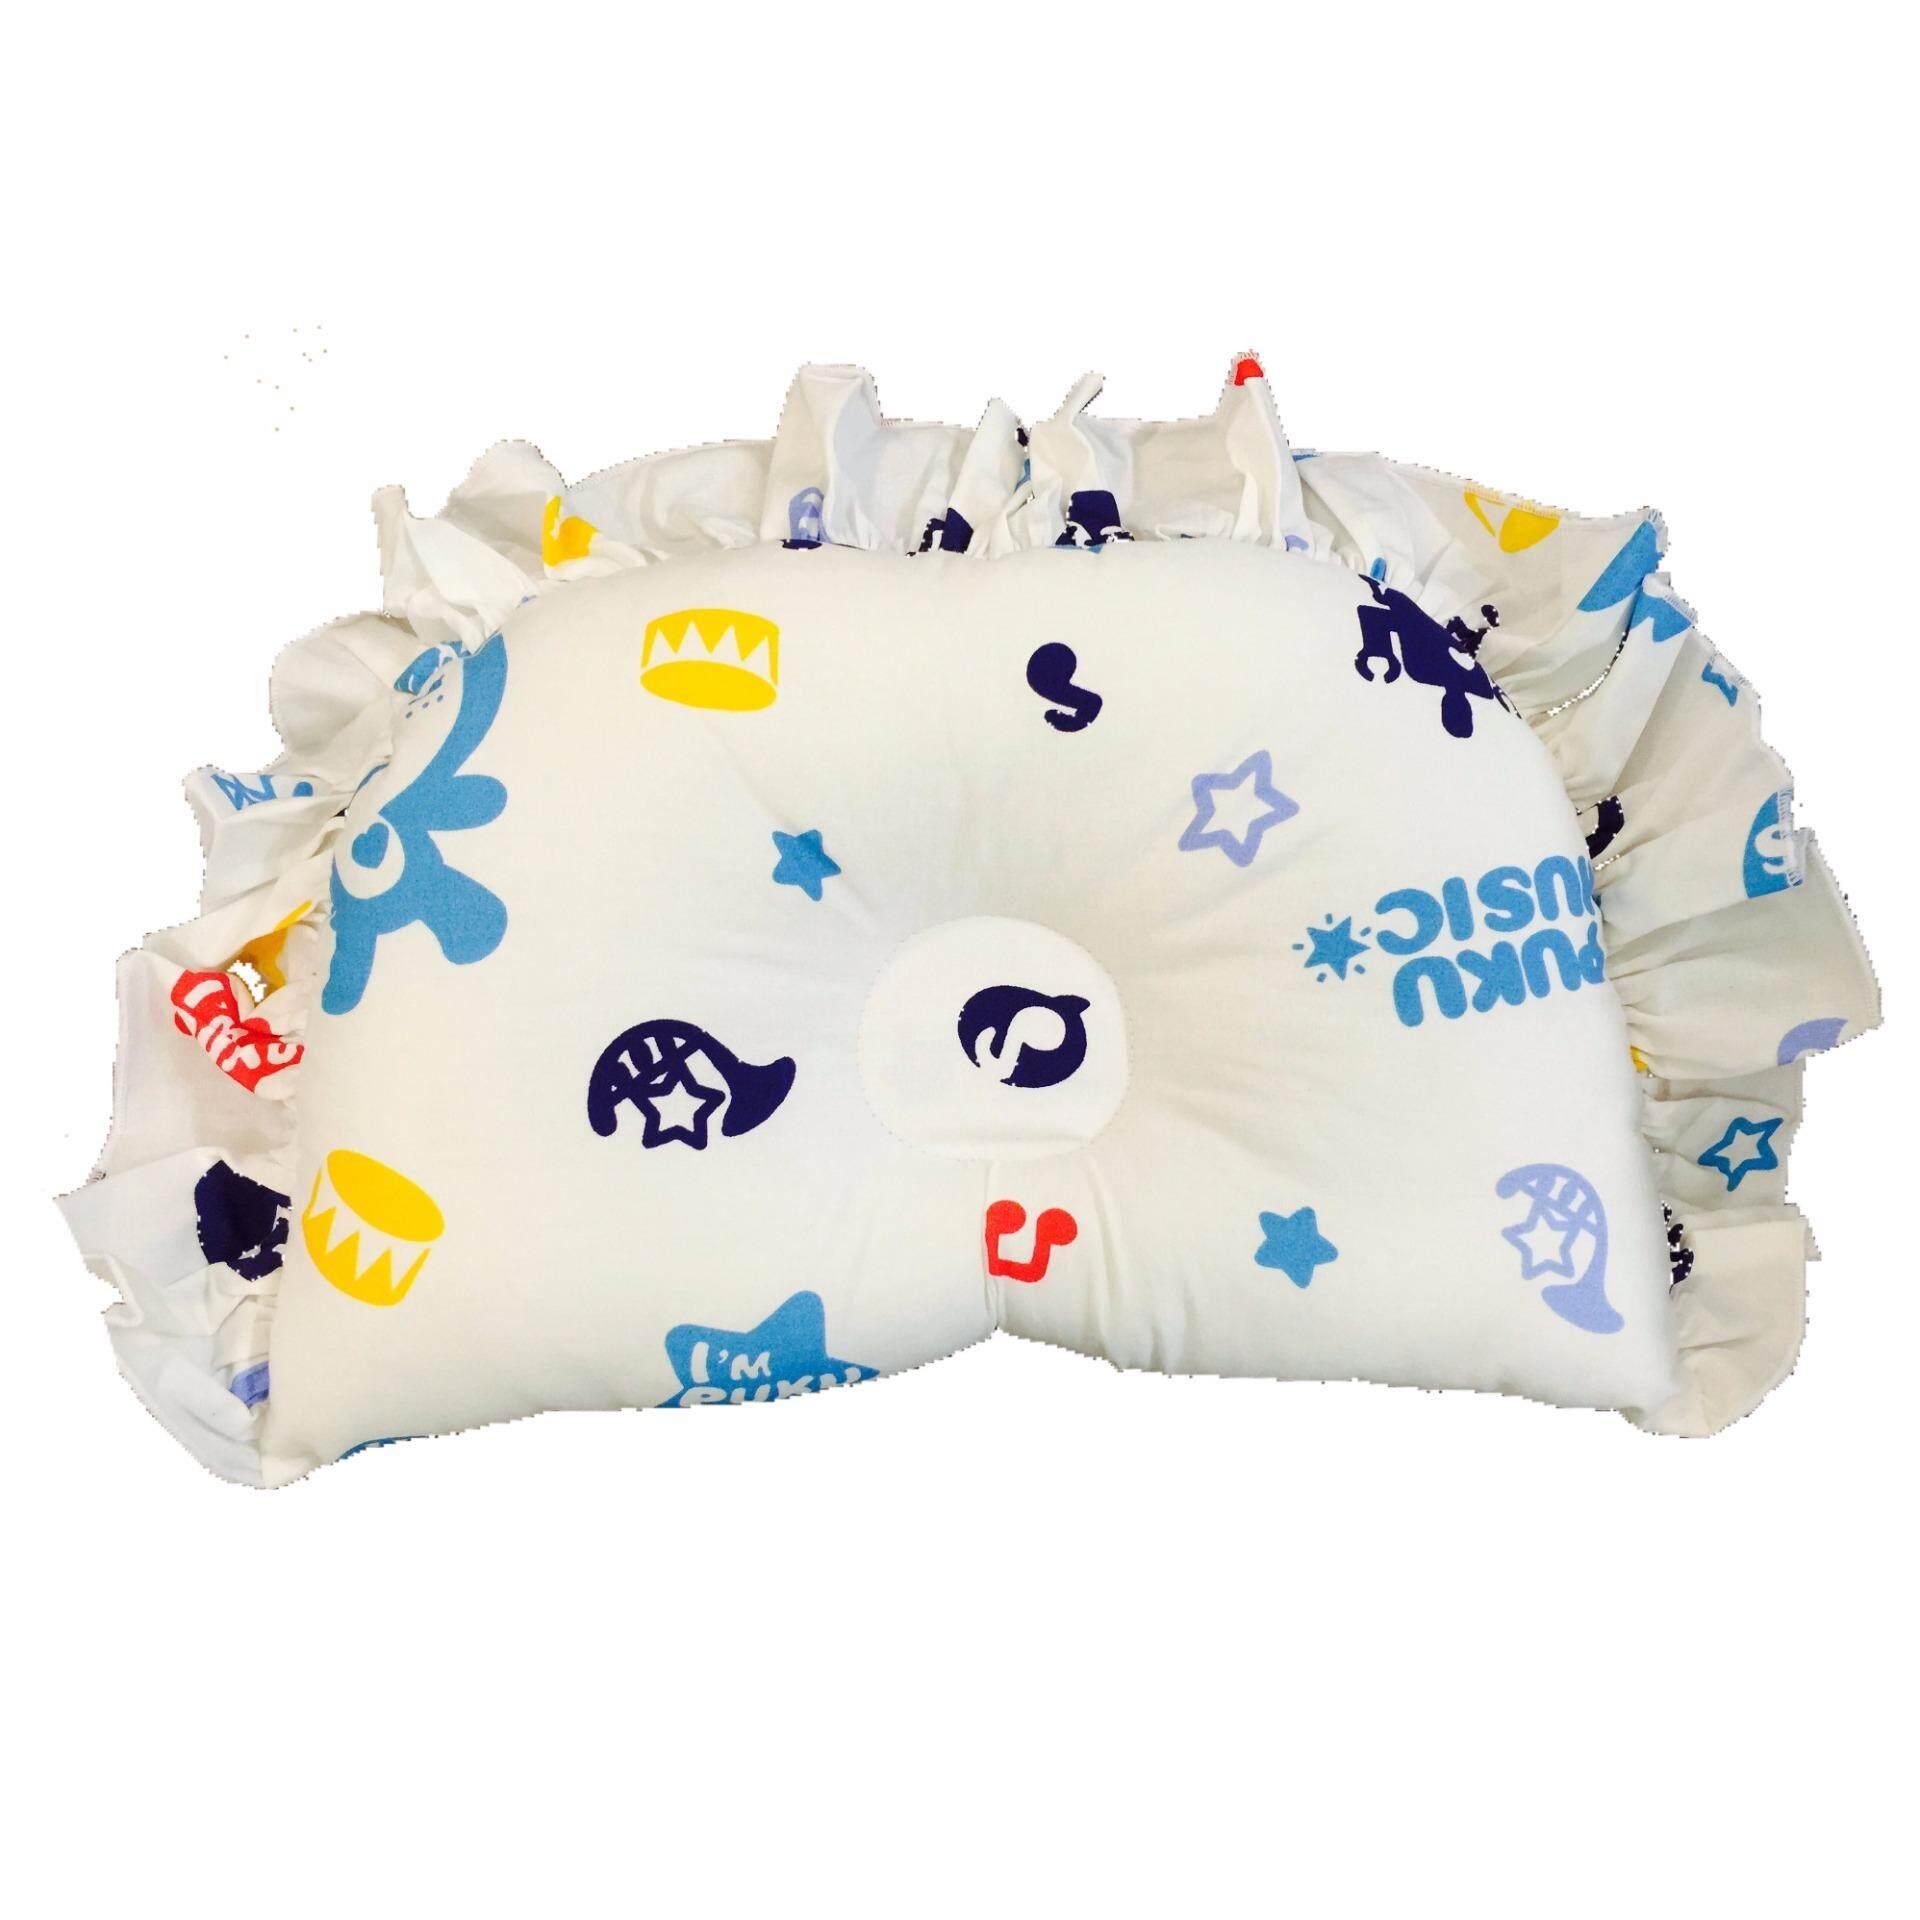 PUKU 100% Cotton Hollow Pillow SP91124 Music BLUE Design